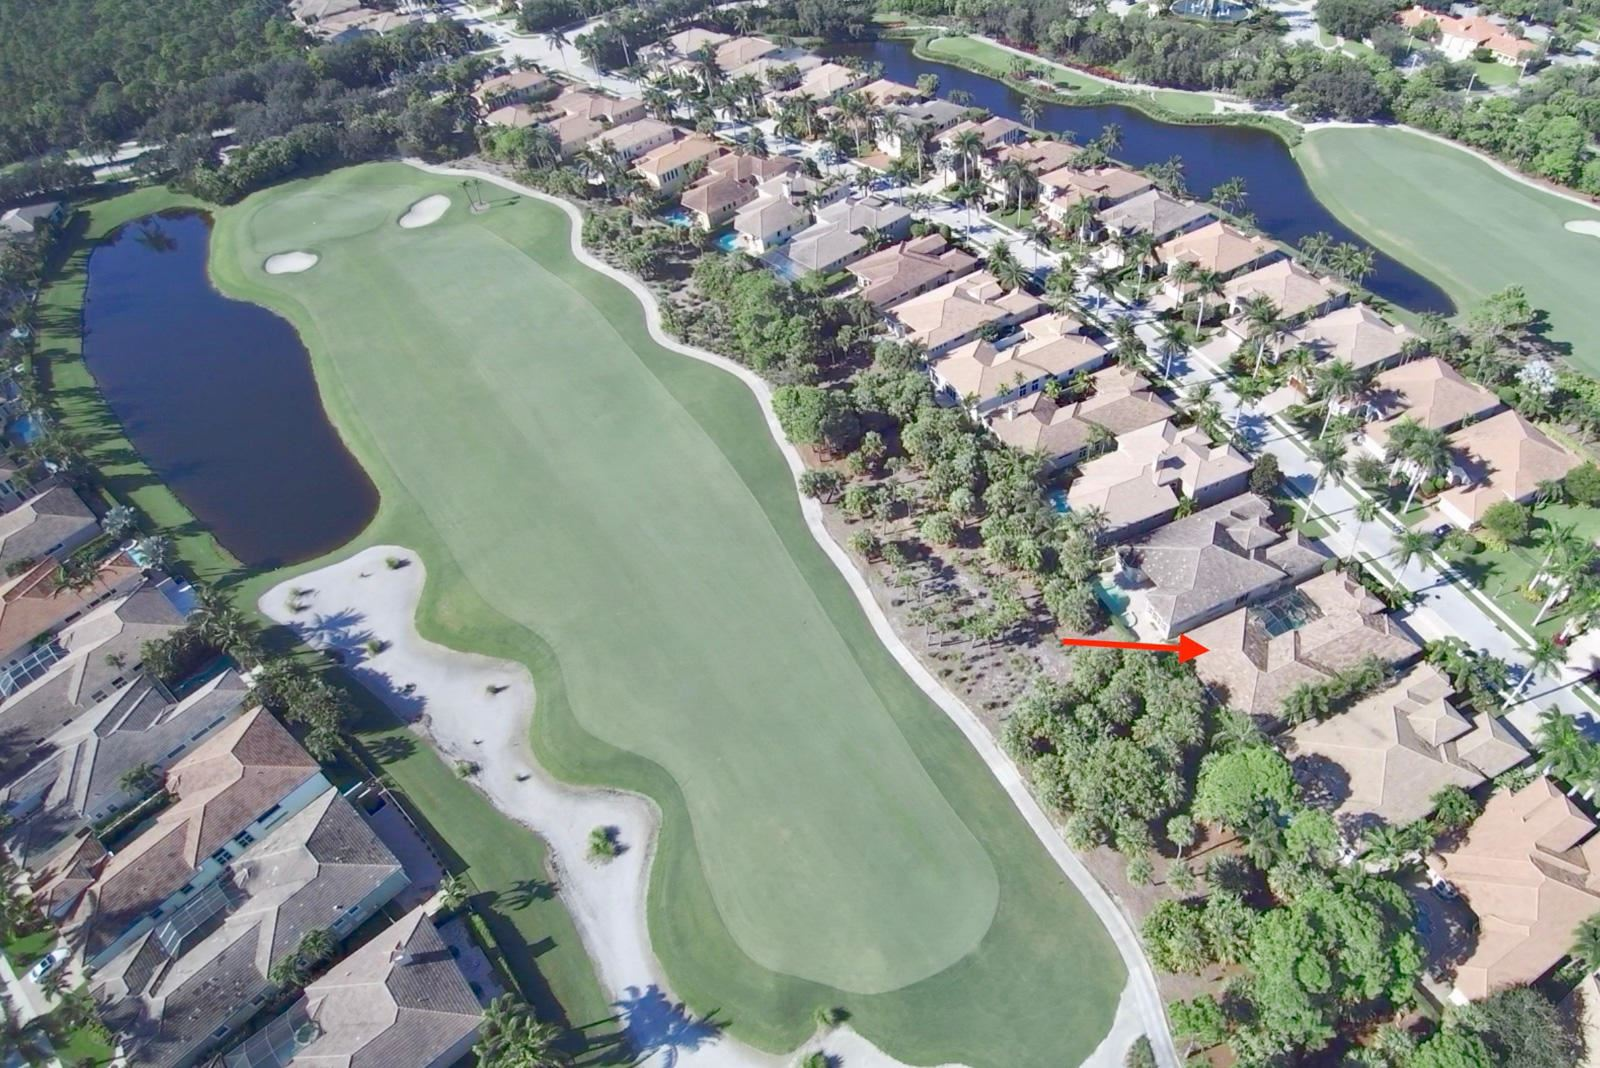 Photo of 128 Abondance Drive, Palm Beach Gardens, FL 33410 (MLS # RX-10619766)